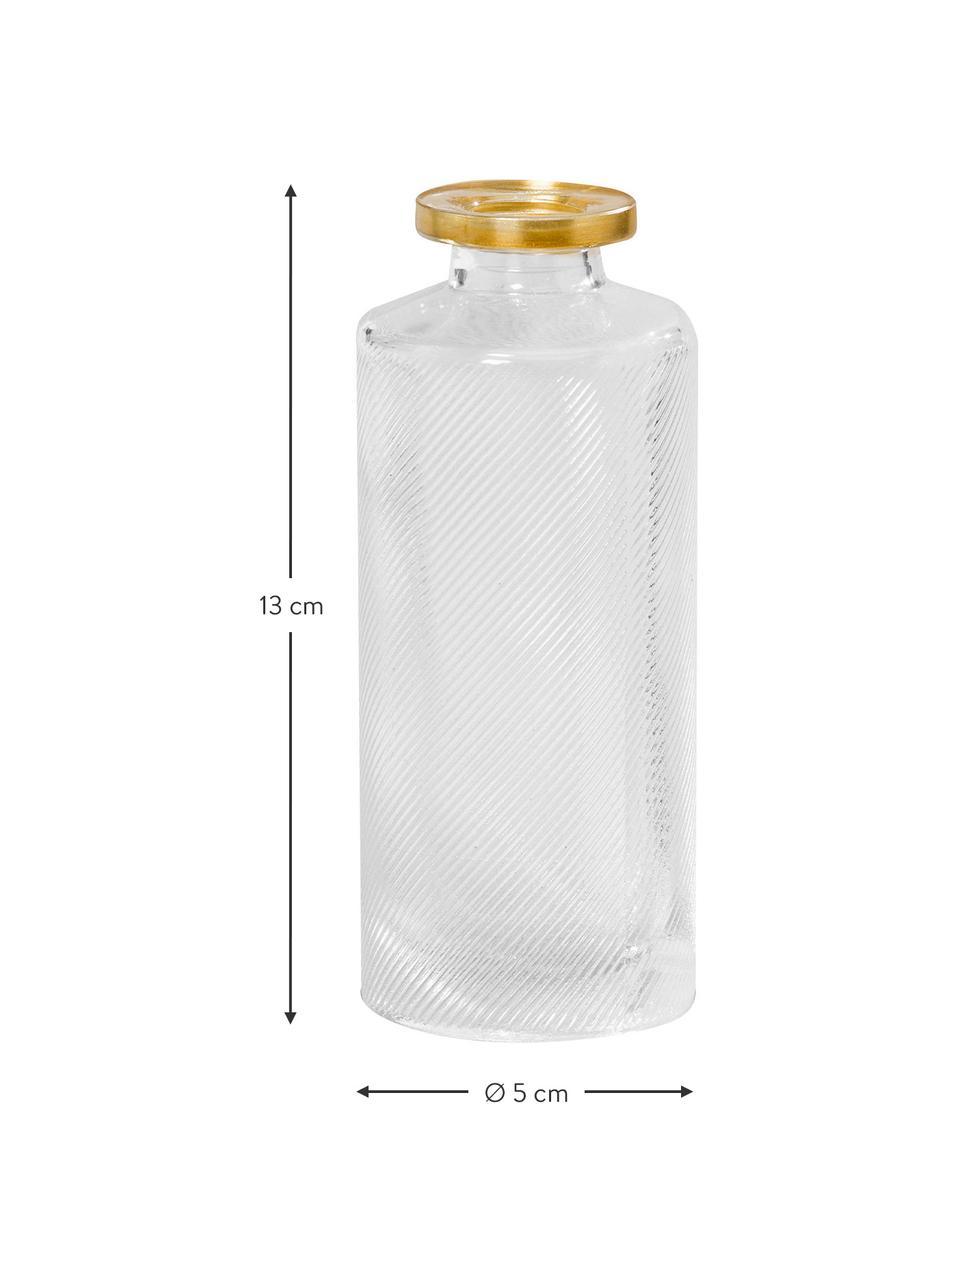 Kleines Vasen-Set Adore aus Glas, 3-tlg., Glas, lackiert, Transparent, Goldfarben, Ø 5 x H 13 cm